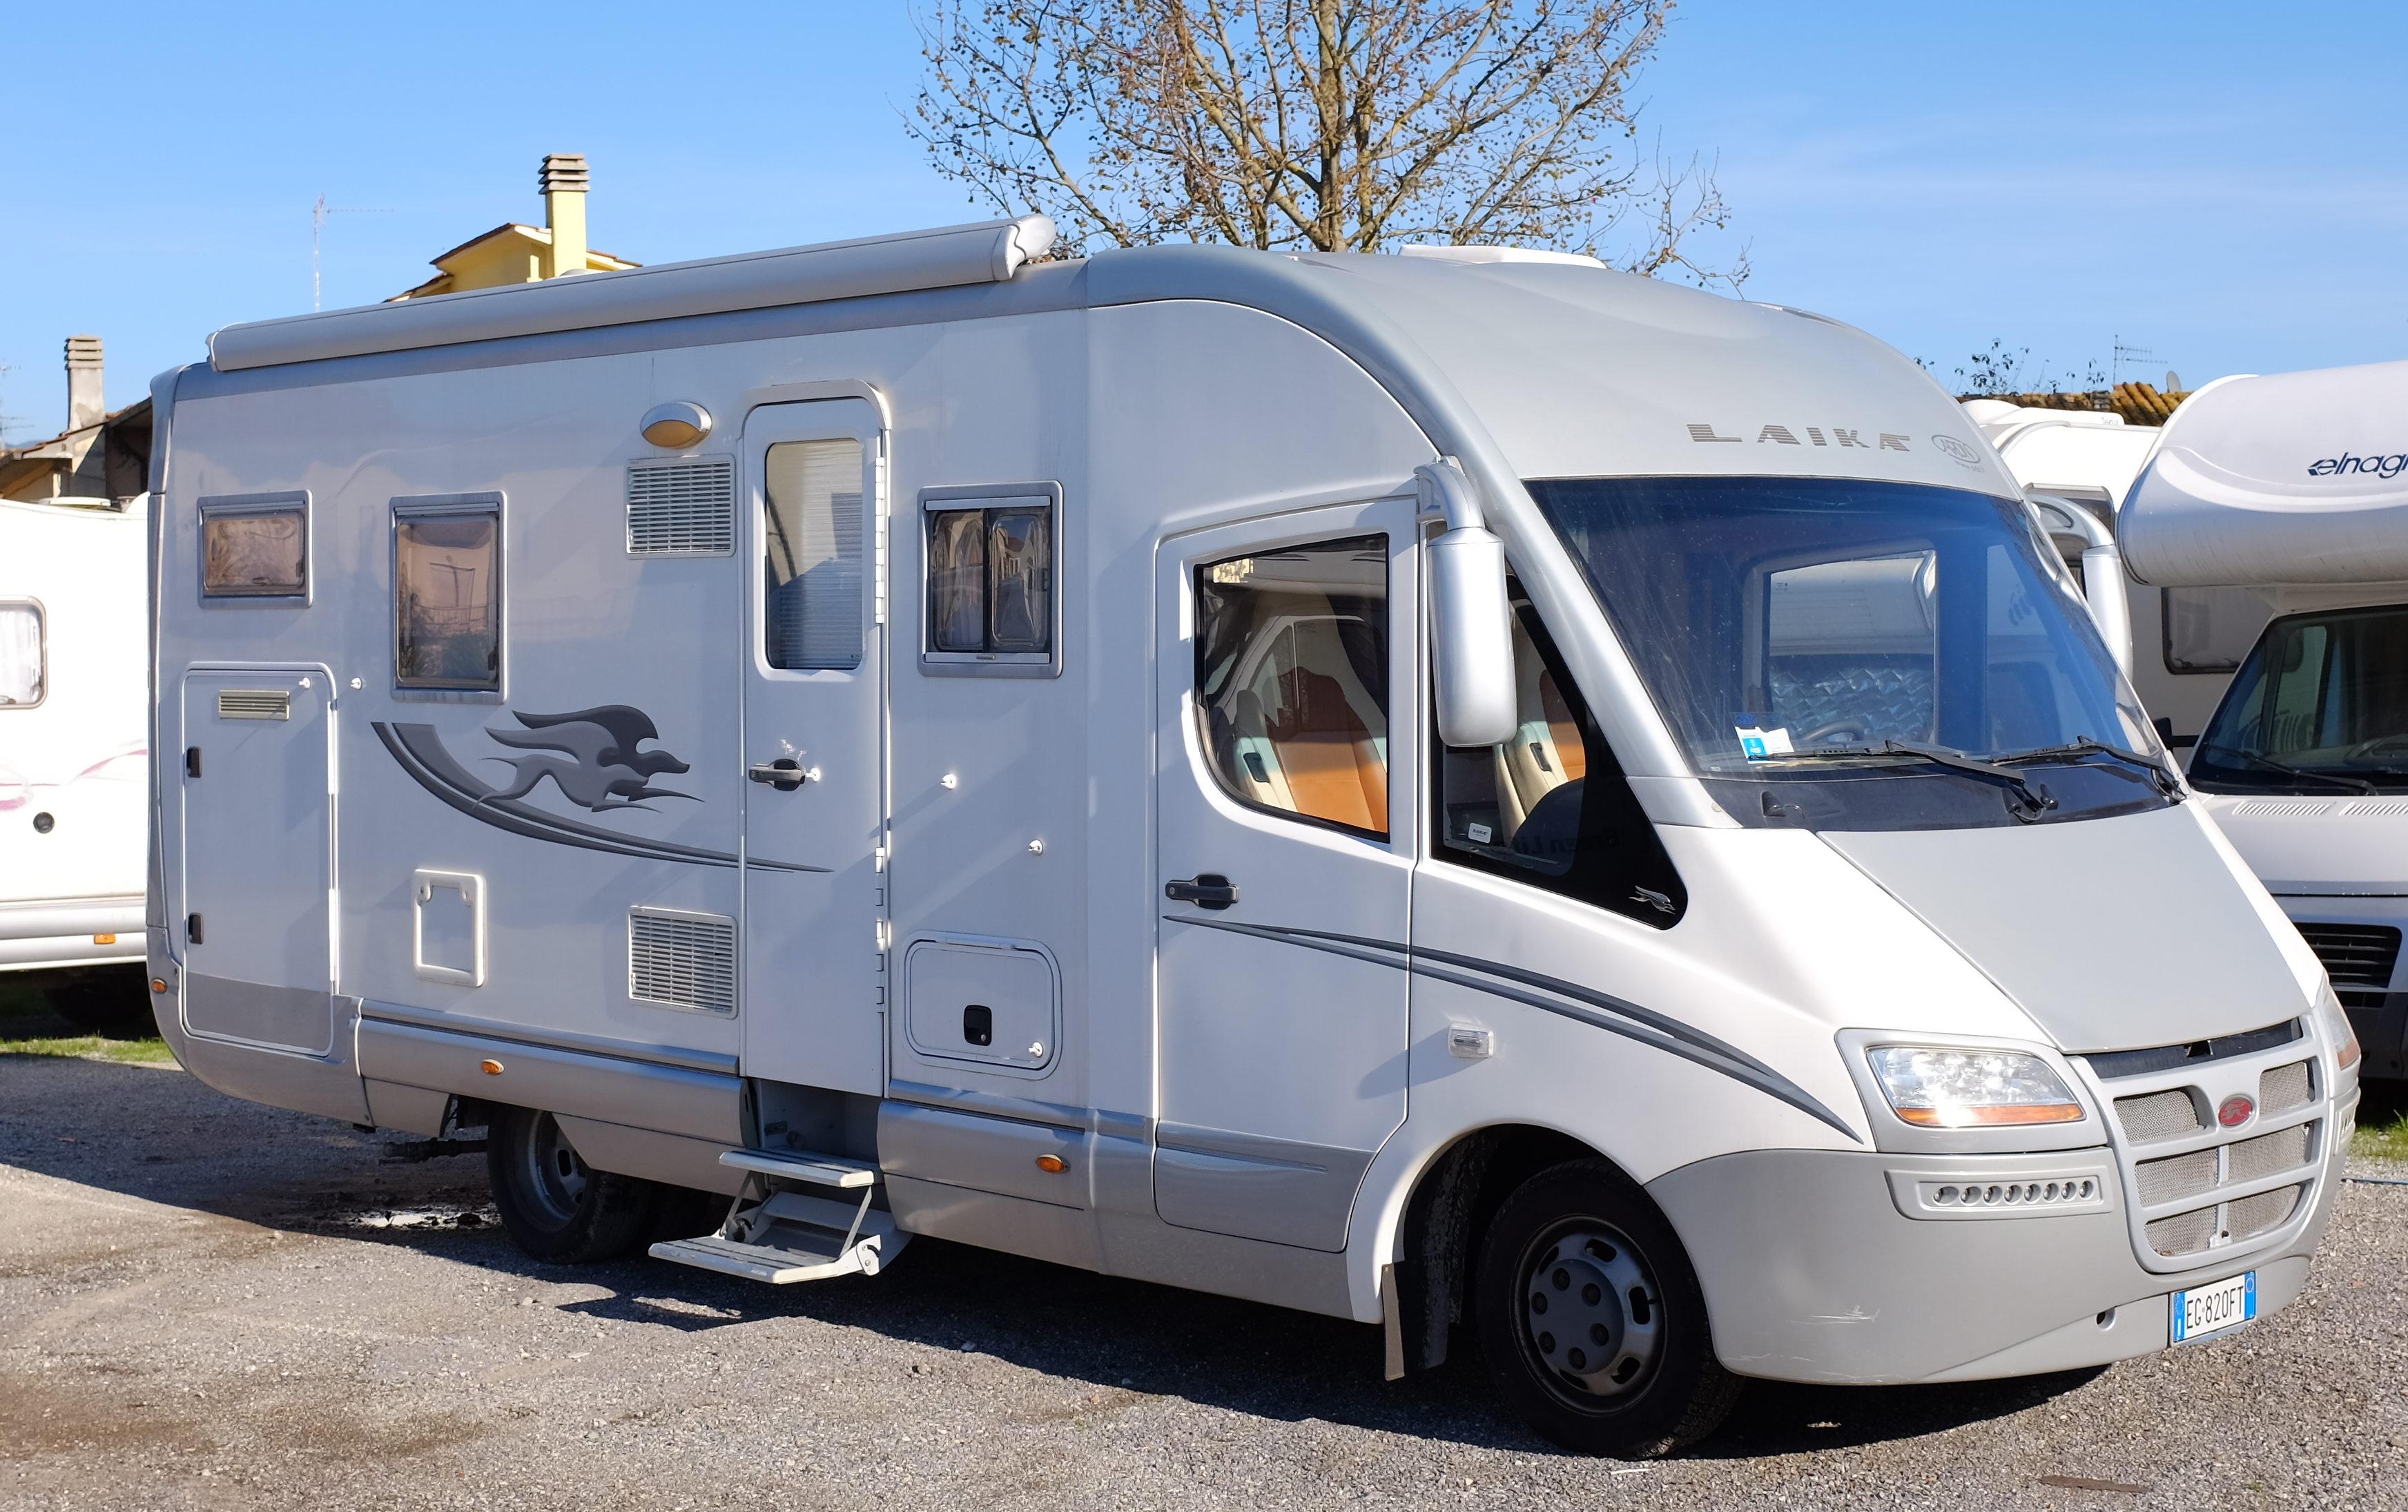 Motorhome usato laika rexosline 720 anno 2011 abc camper for Laika camper